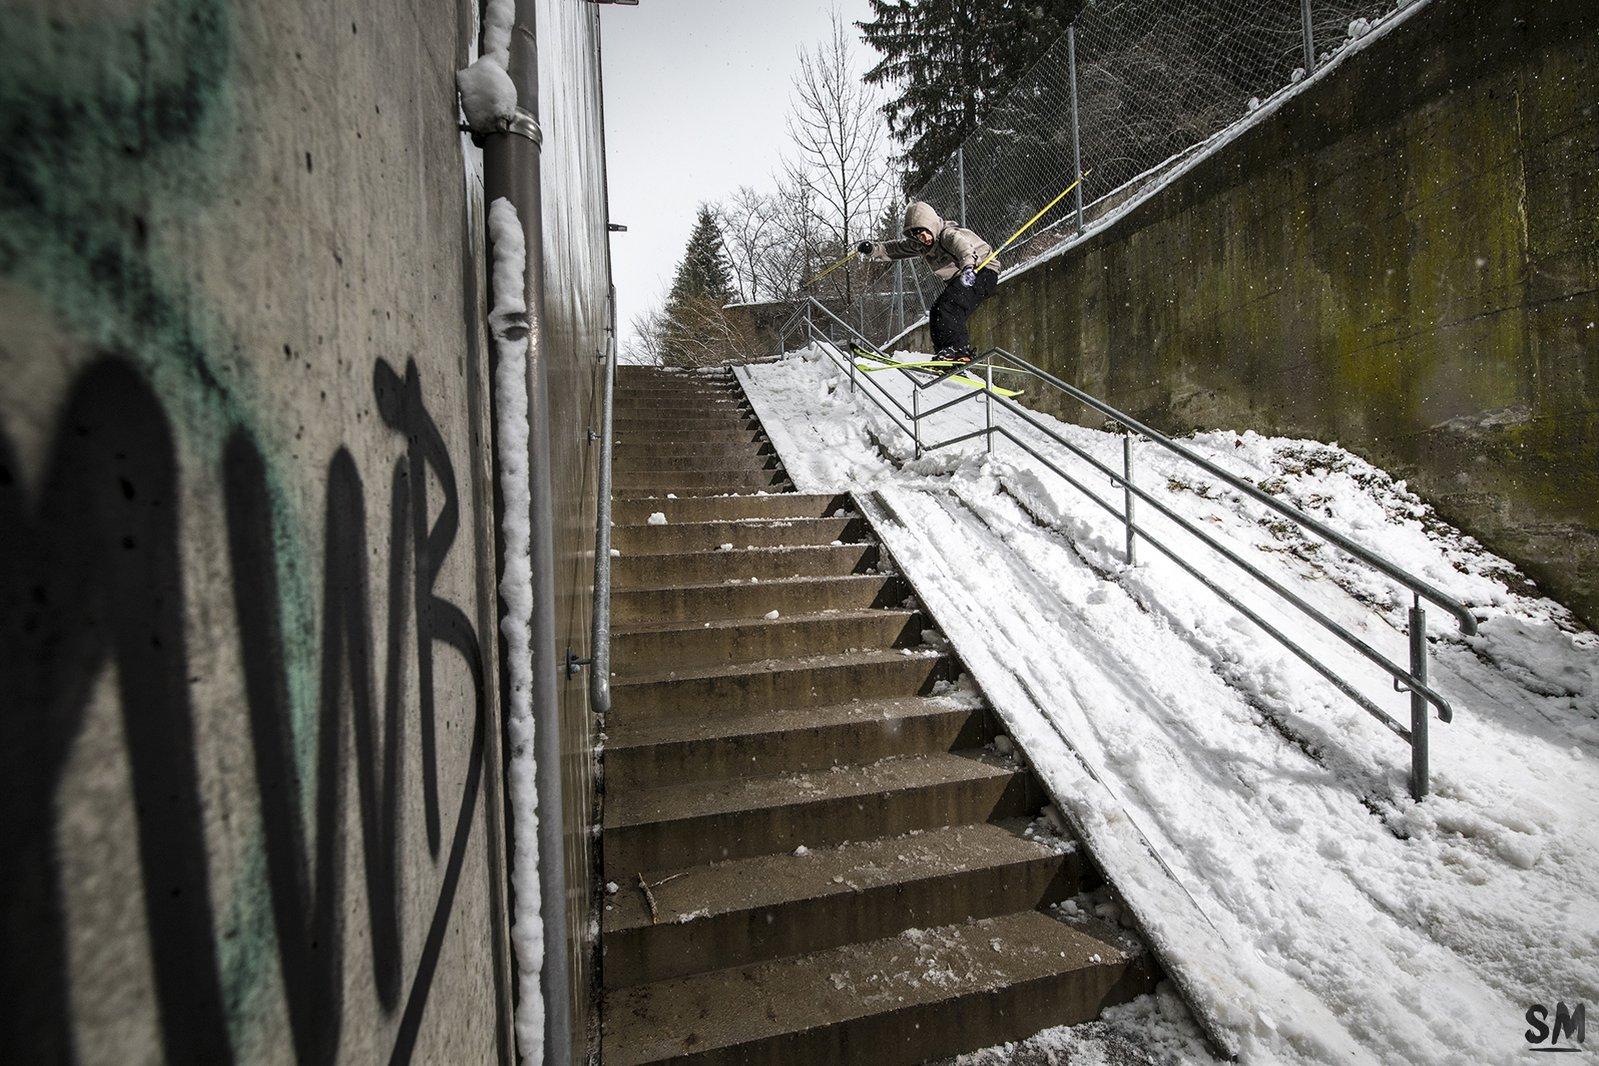 Handrail IBK